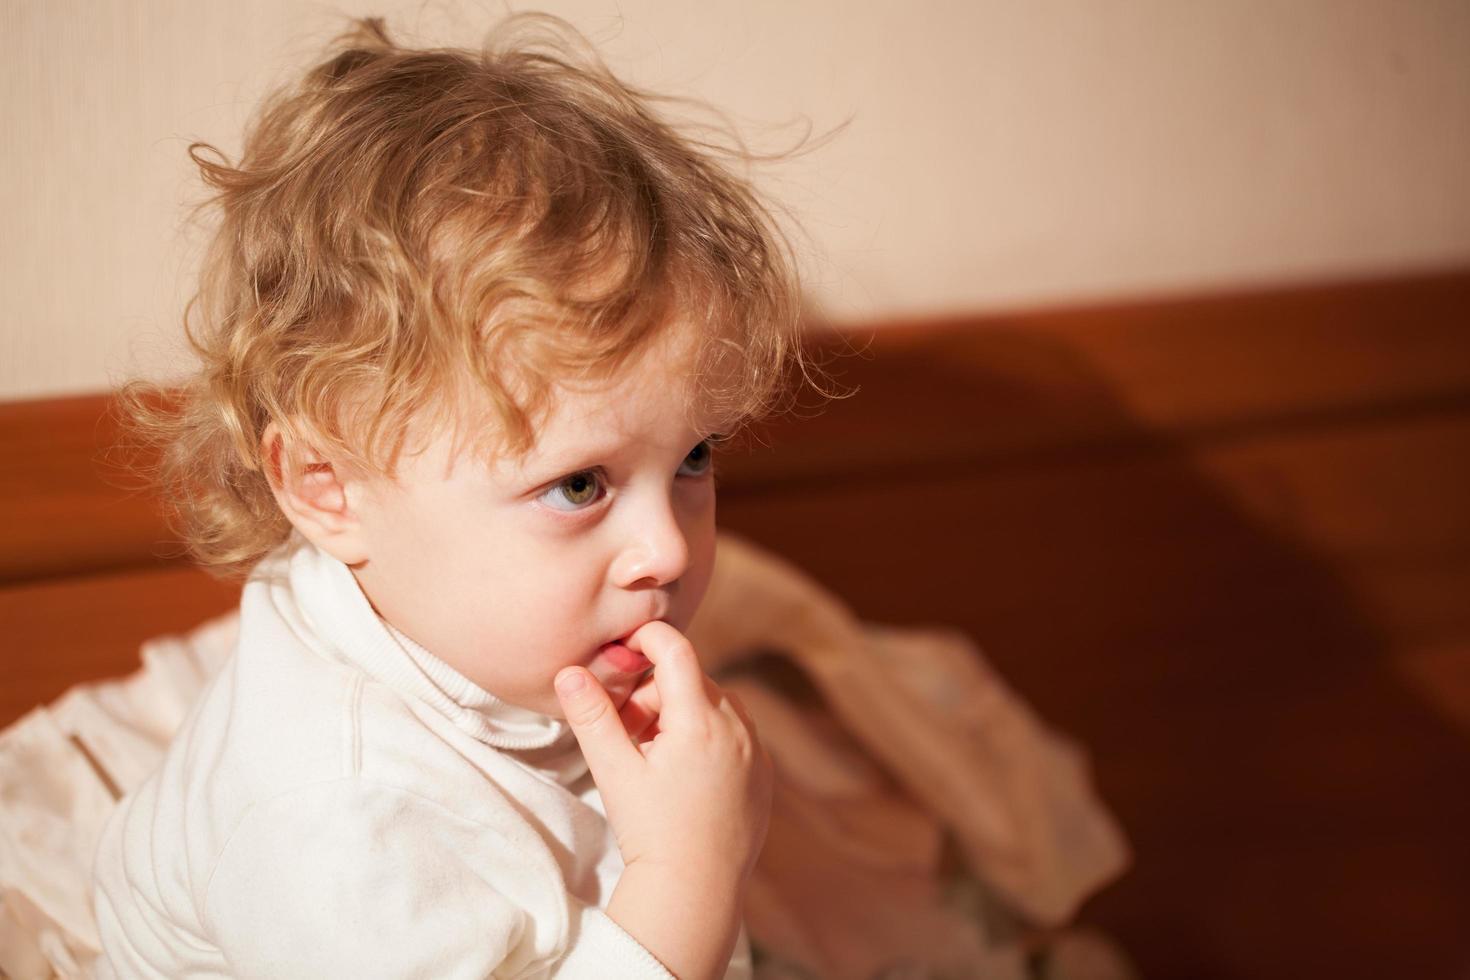 niño mirando hacia adelante con expresión pensativa foto